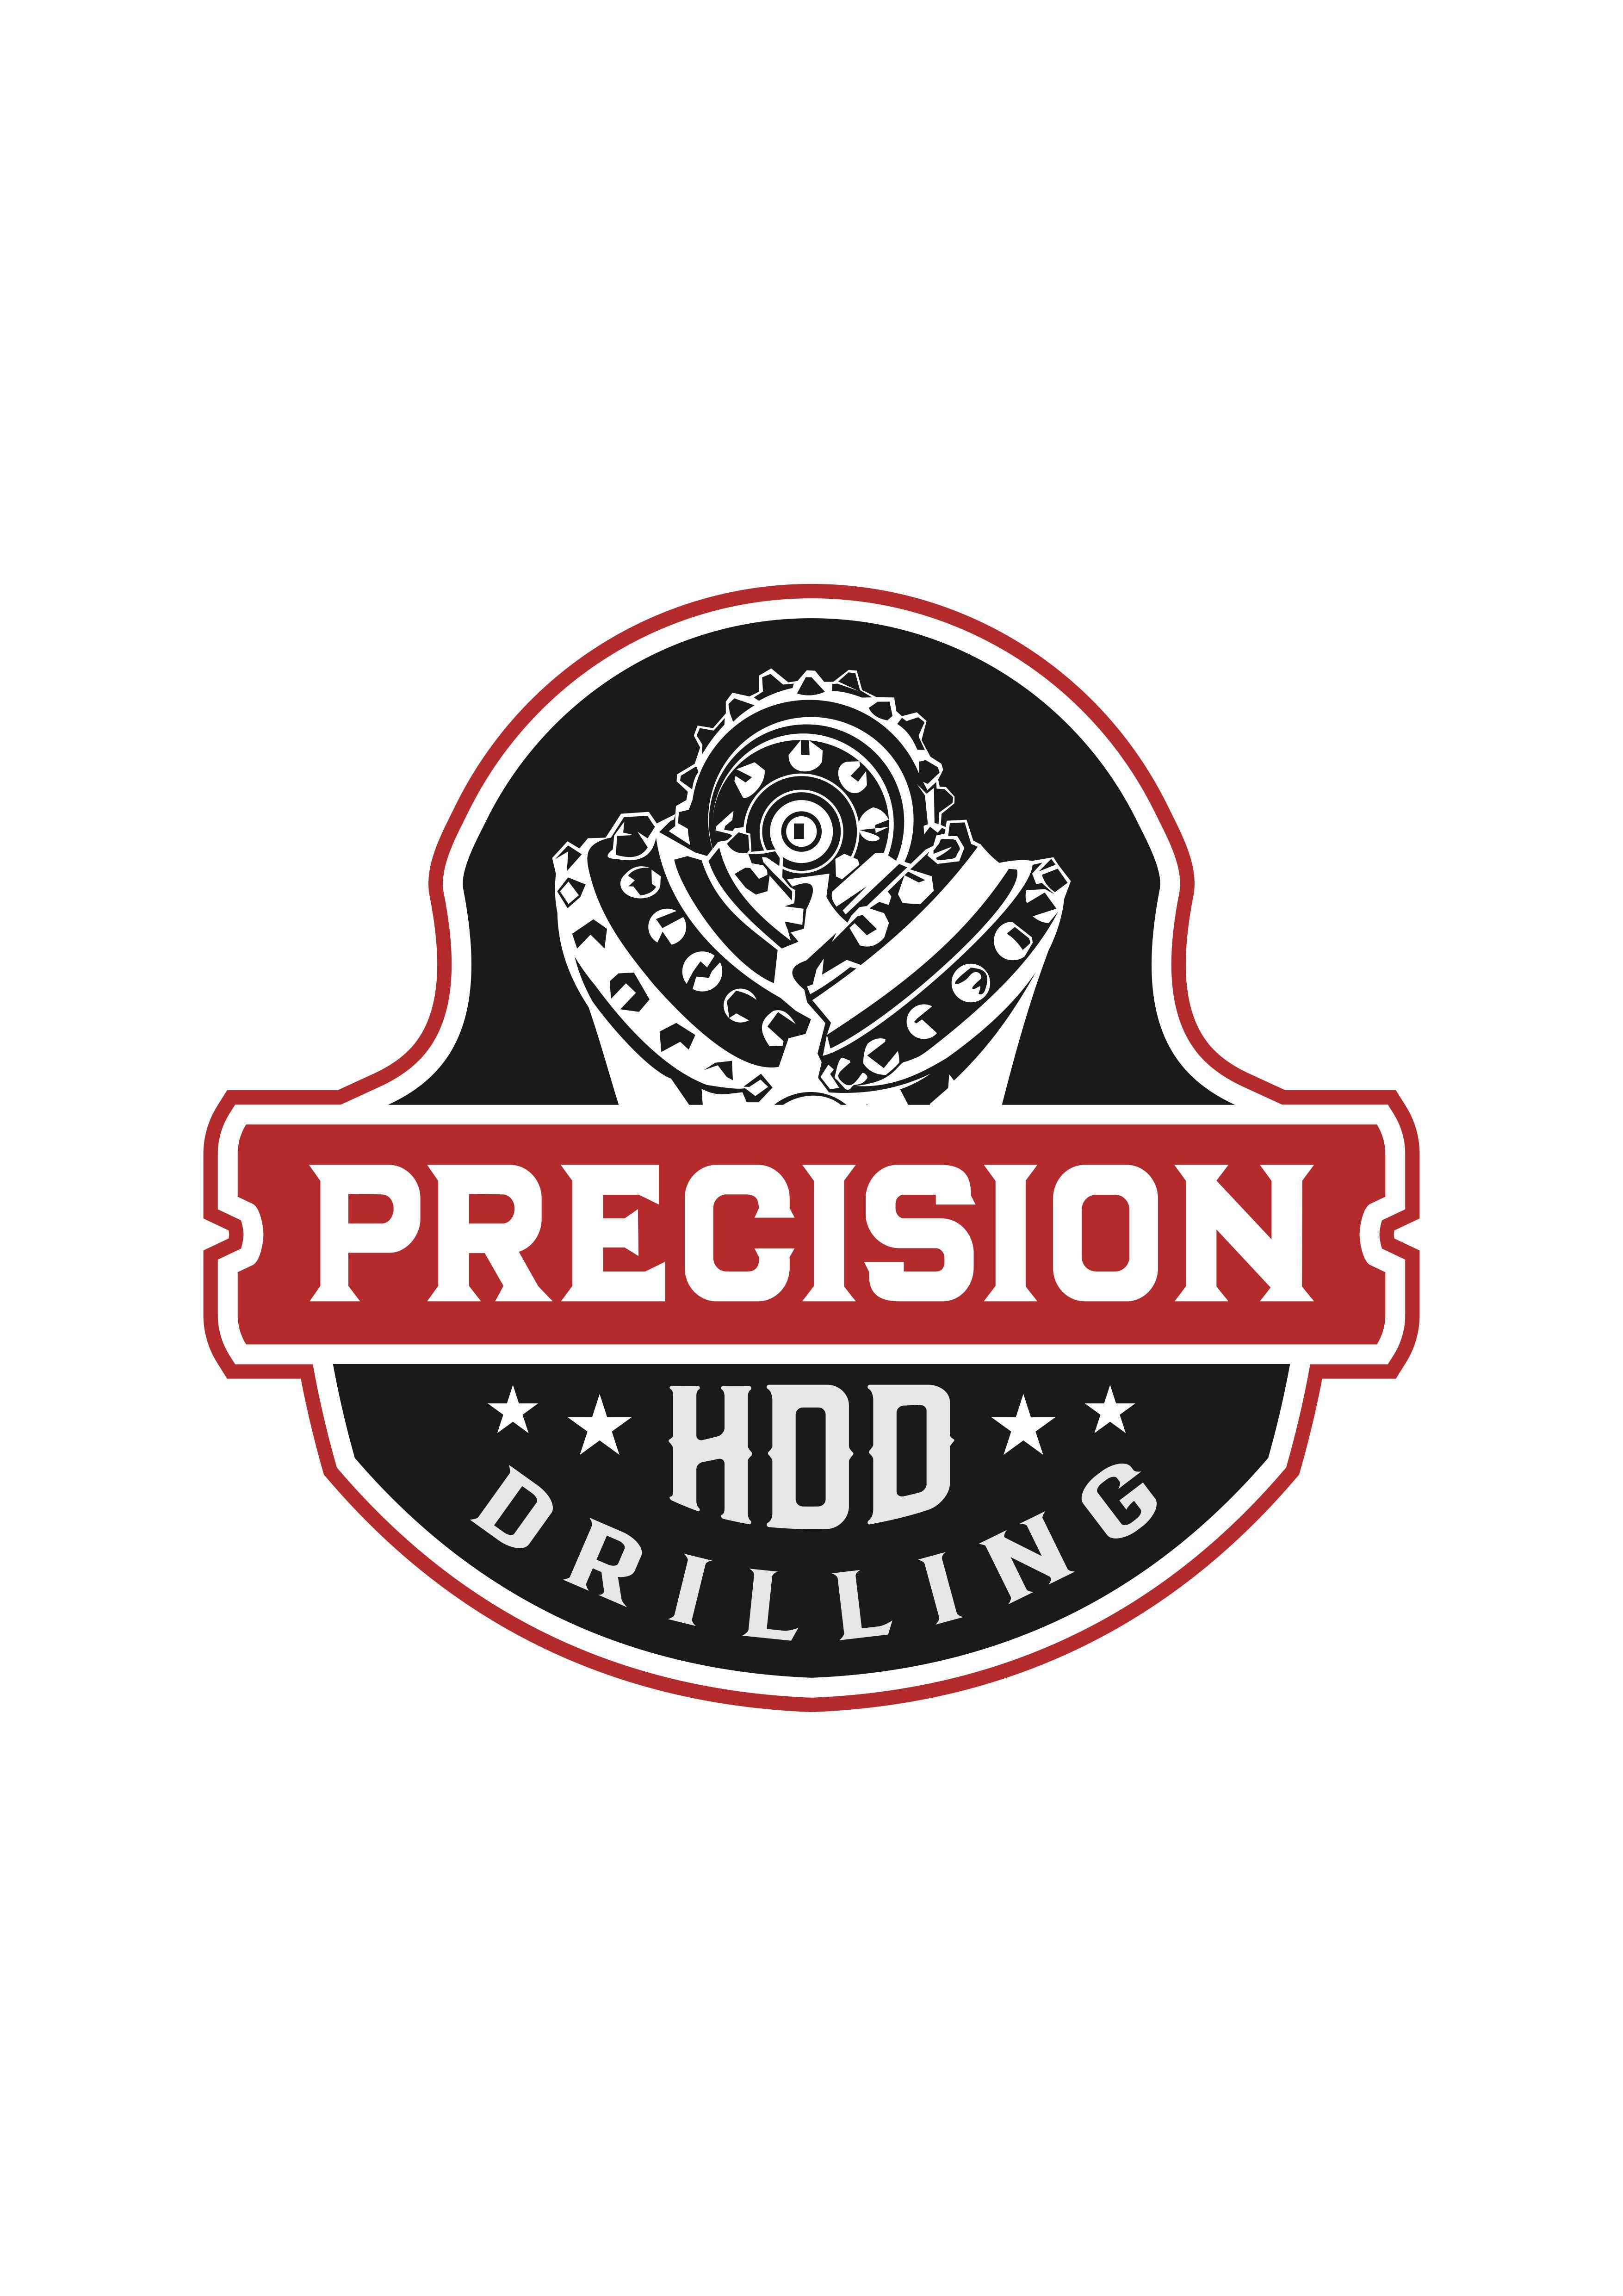 Precision HDD Drilling New Logo